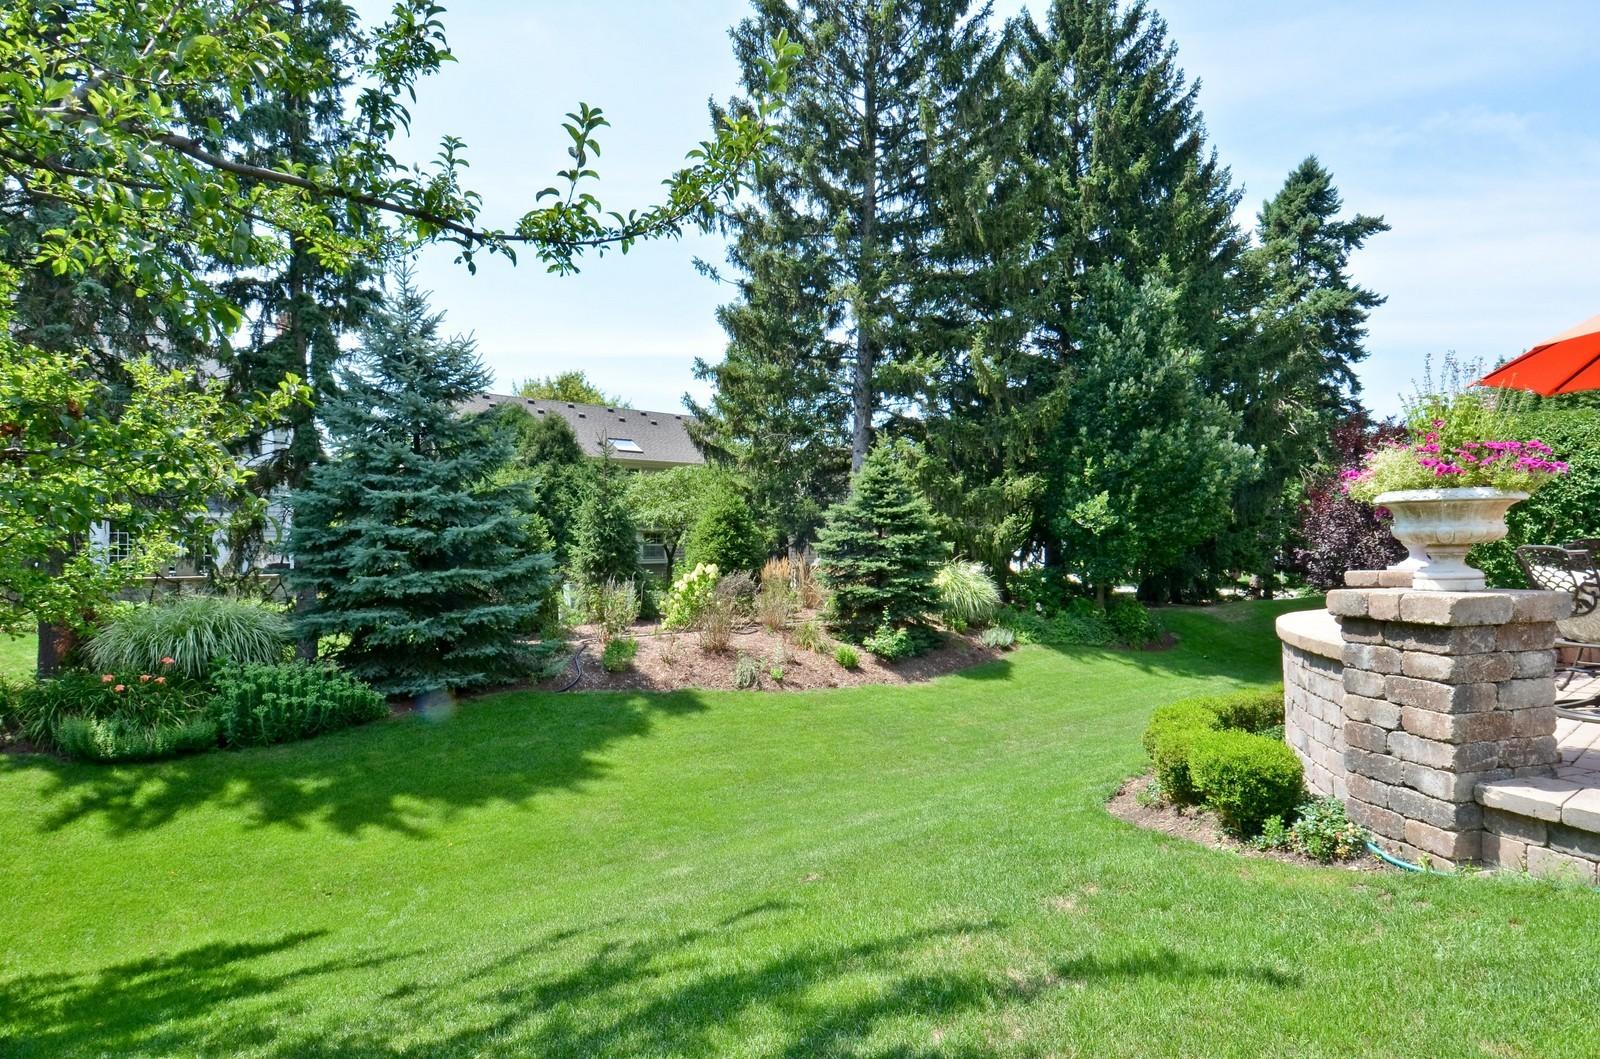 Real Estate Photography - 1492 Lloyd, Wheaton, IL, 60189 - Back yard, view 2